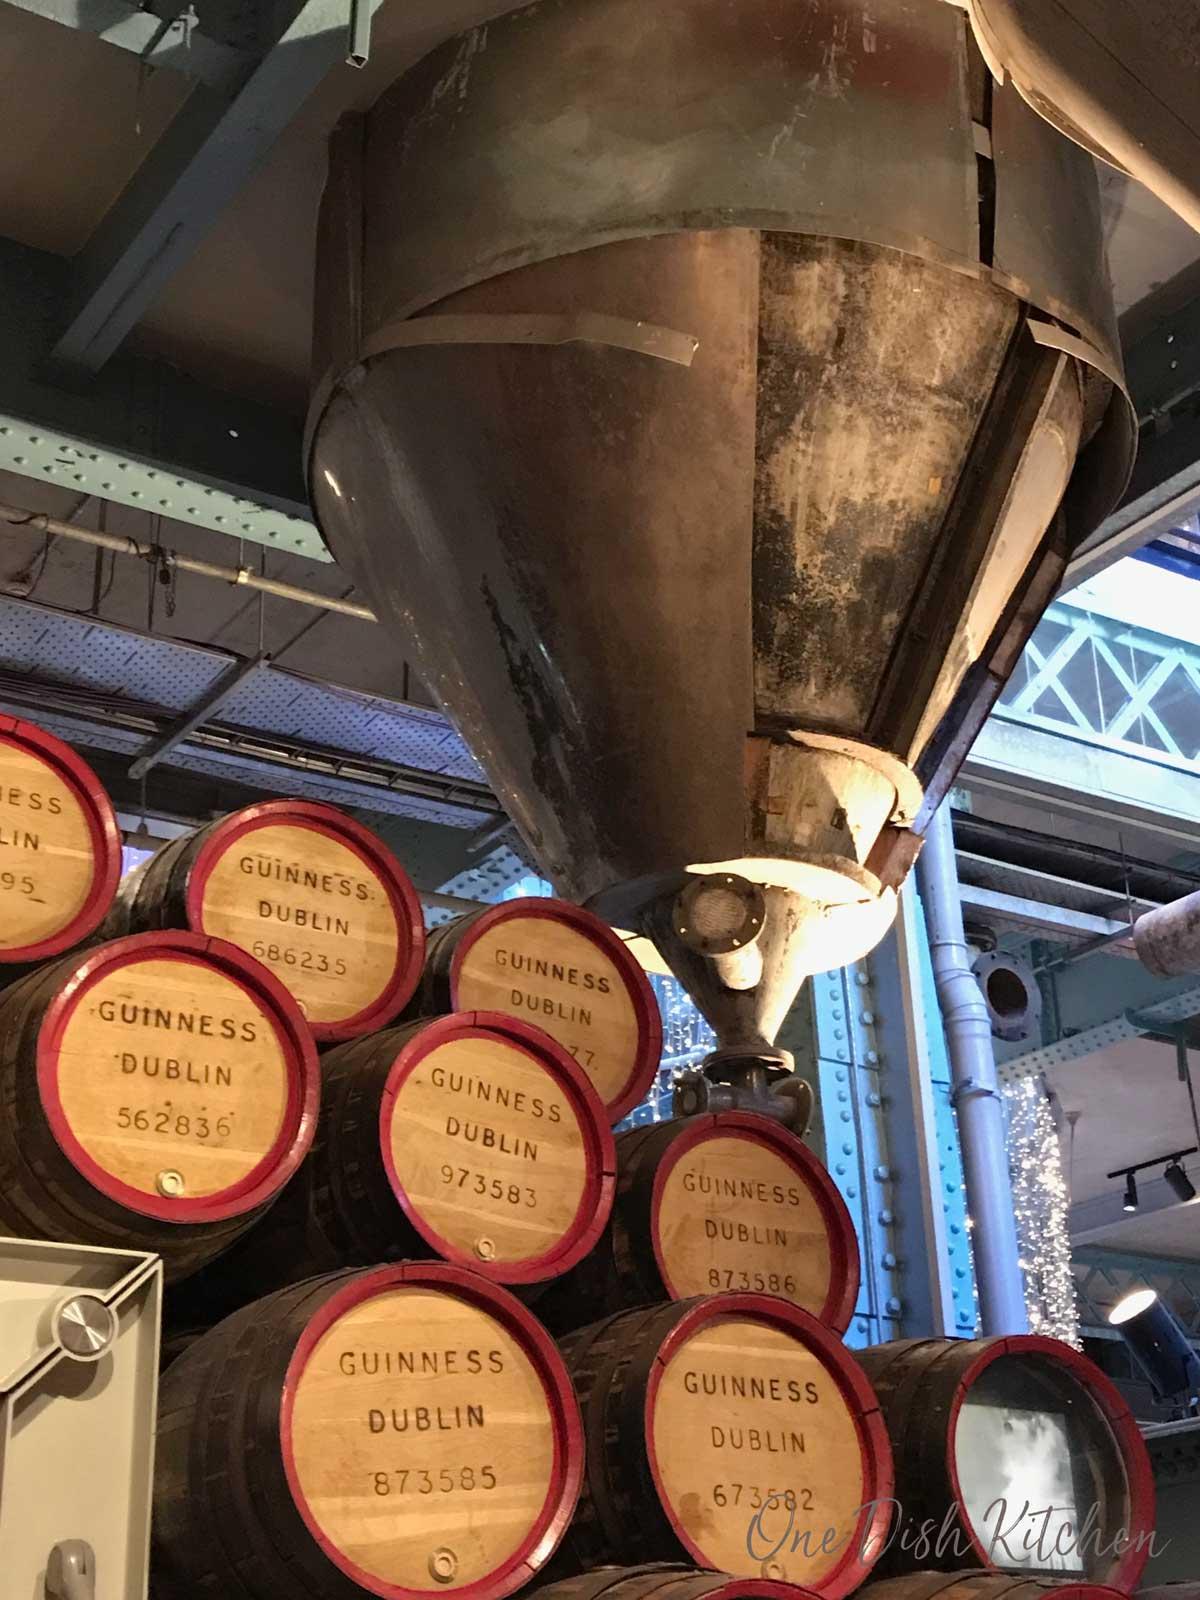 Kegs of beer stacked in the Guinness storehouse in Dublin, Ireland